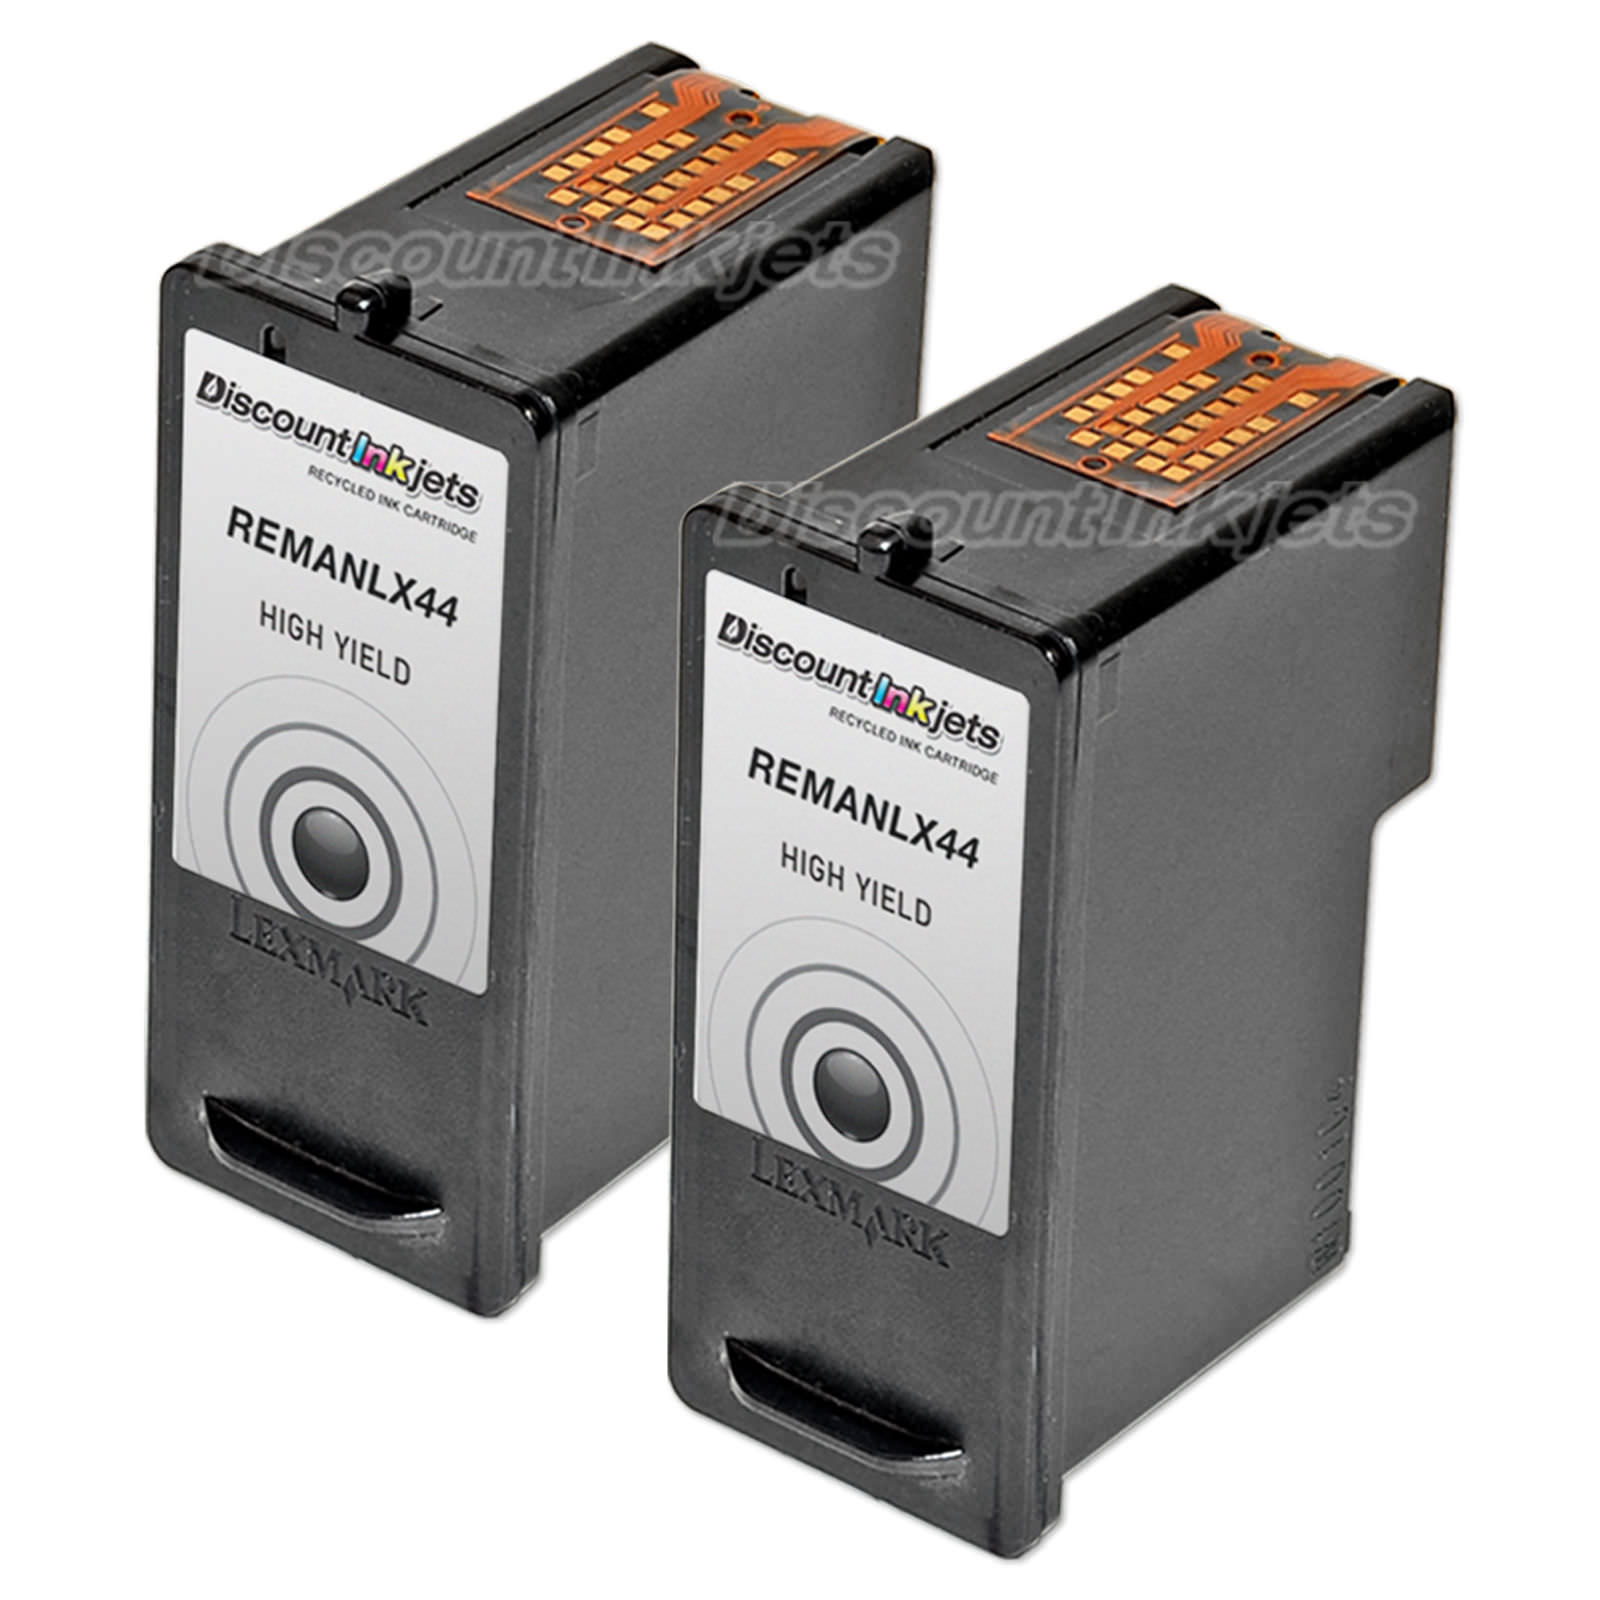 2pk 18y0144 for lexmark 44xl black ink cartridge printer x9570 x9575 rh ebay com Lexmark All in One Inkjet Printer Ink for Lexmark Printers All in One Printer Model X4875